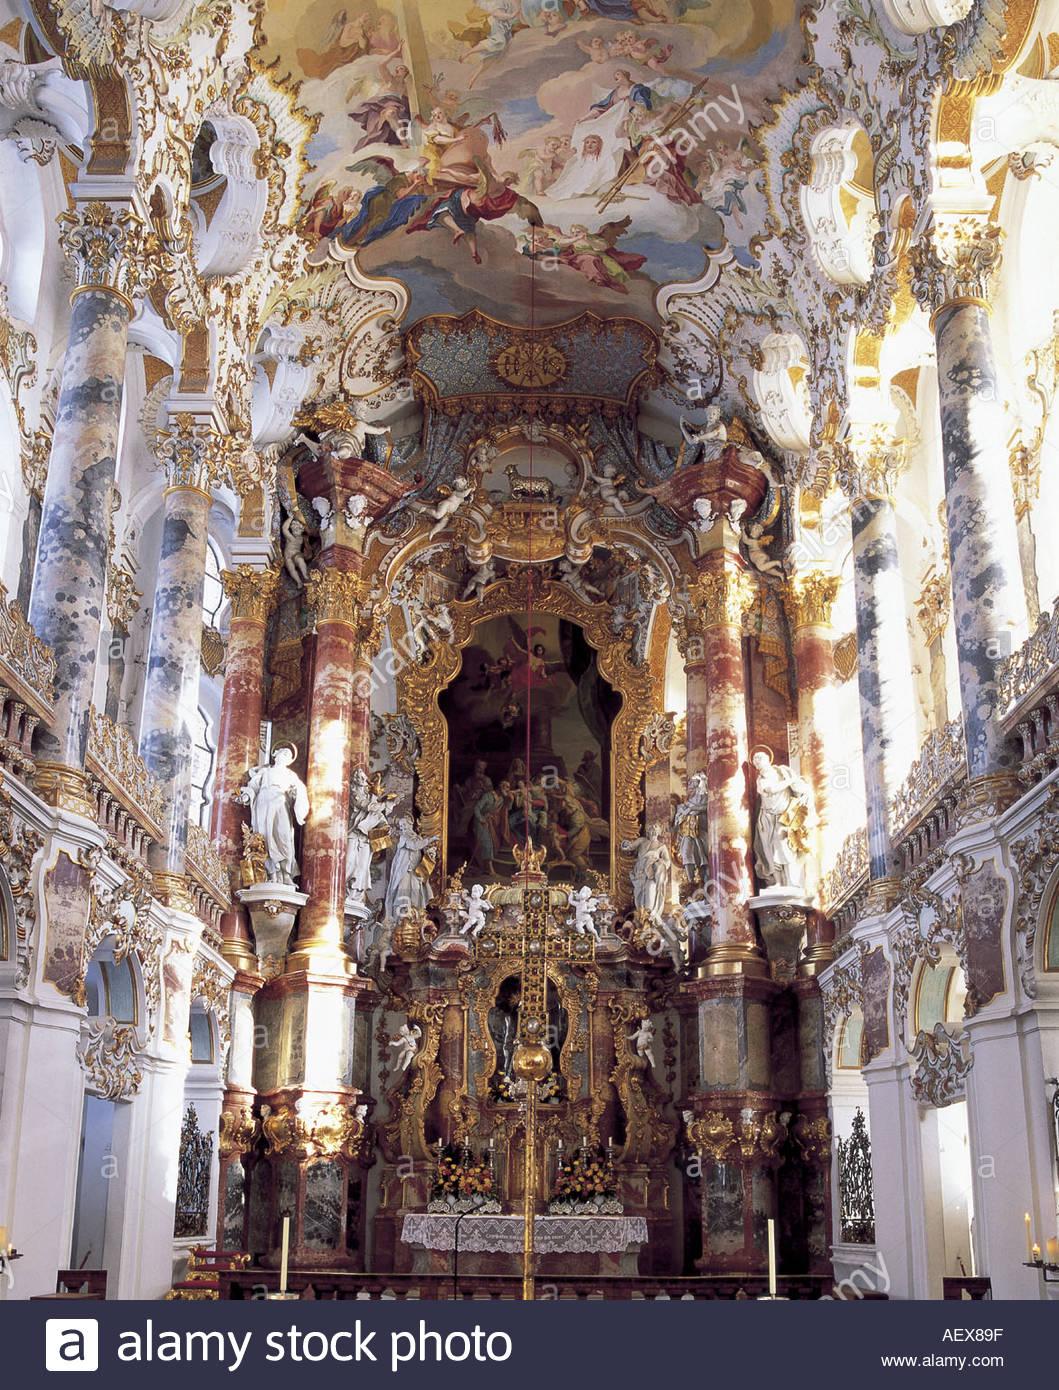 wieskirche-steingaden-germany-AEX89F.jpg